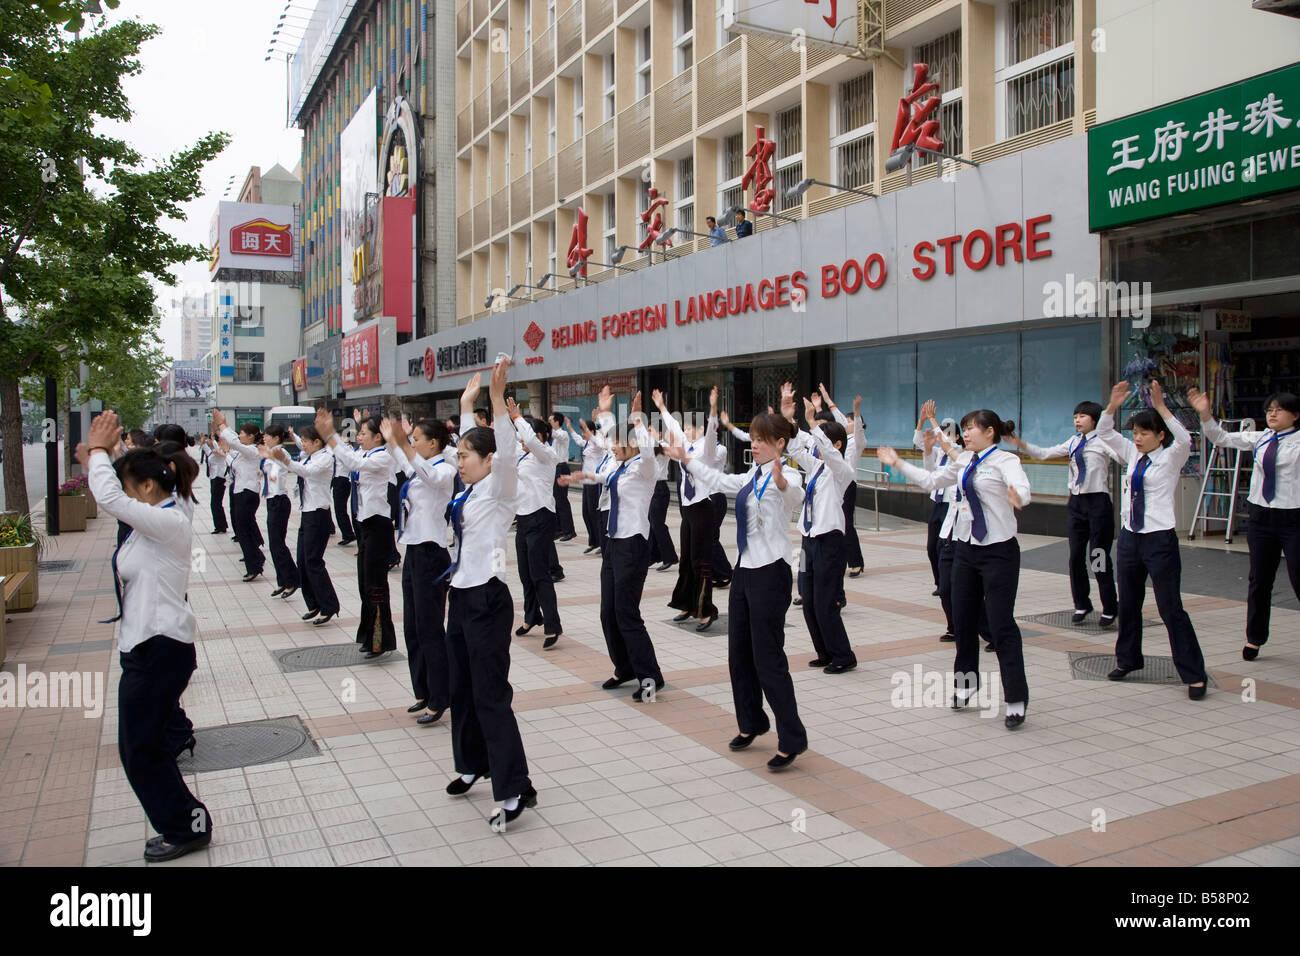 Store workers exercising before work, Wangfujing Road, Beijing, China - Stock Image